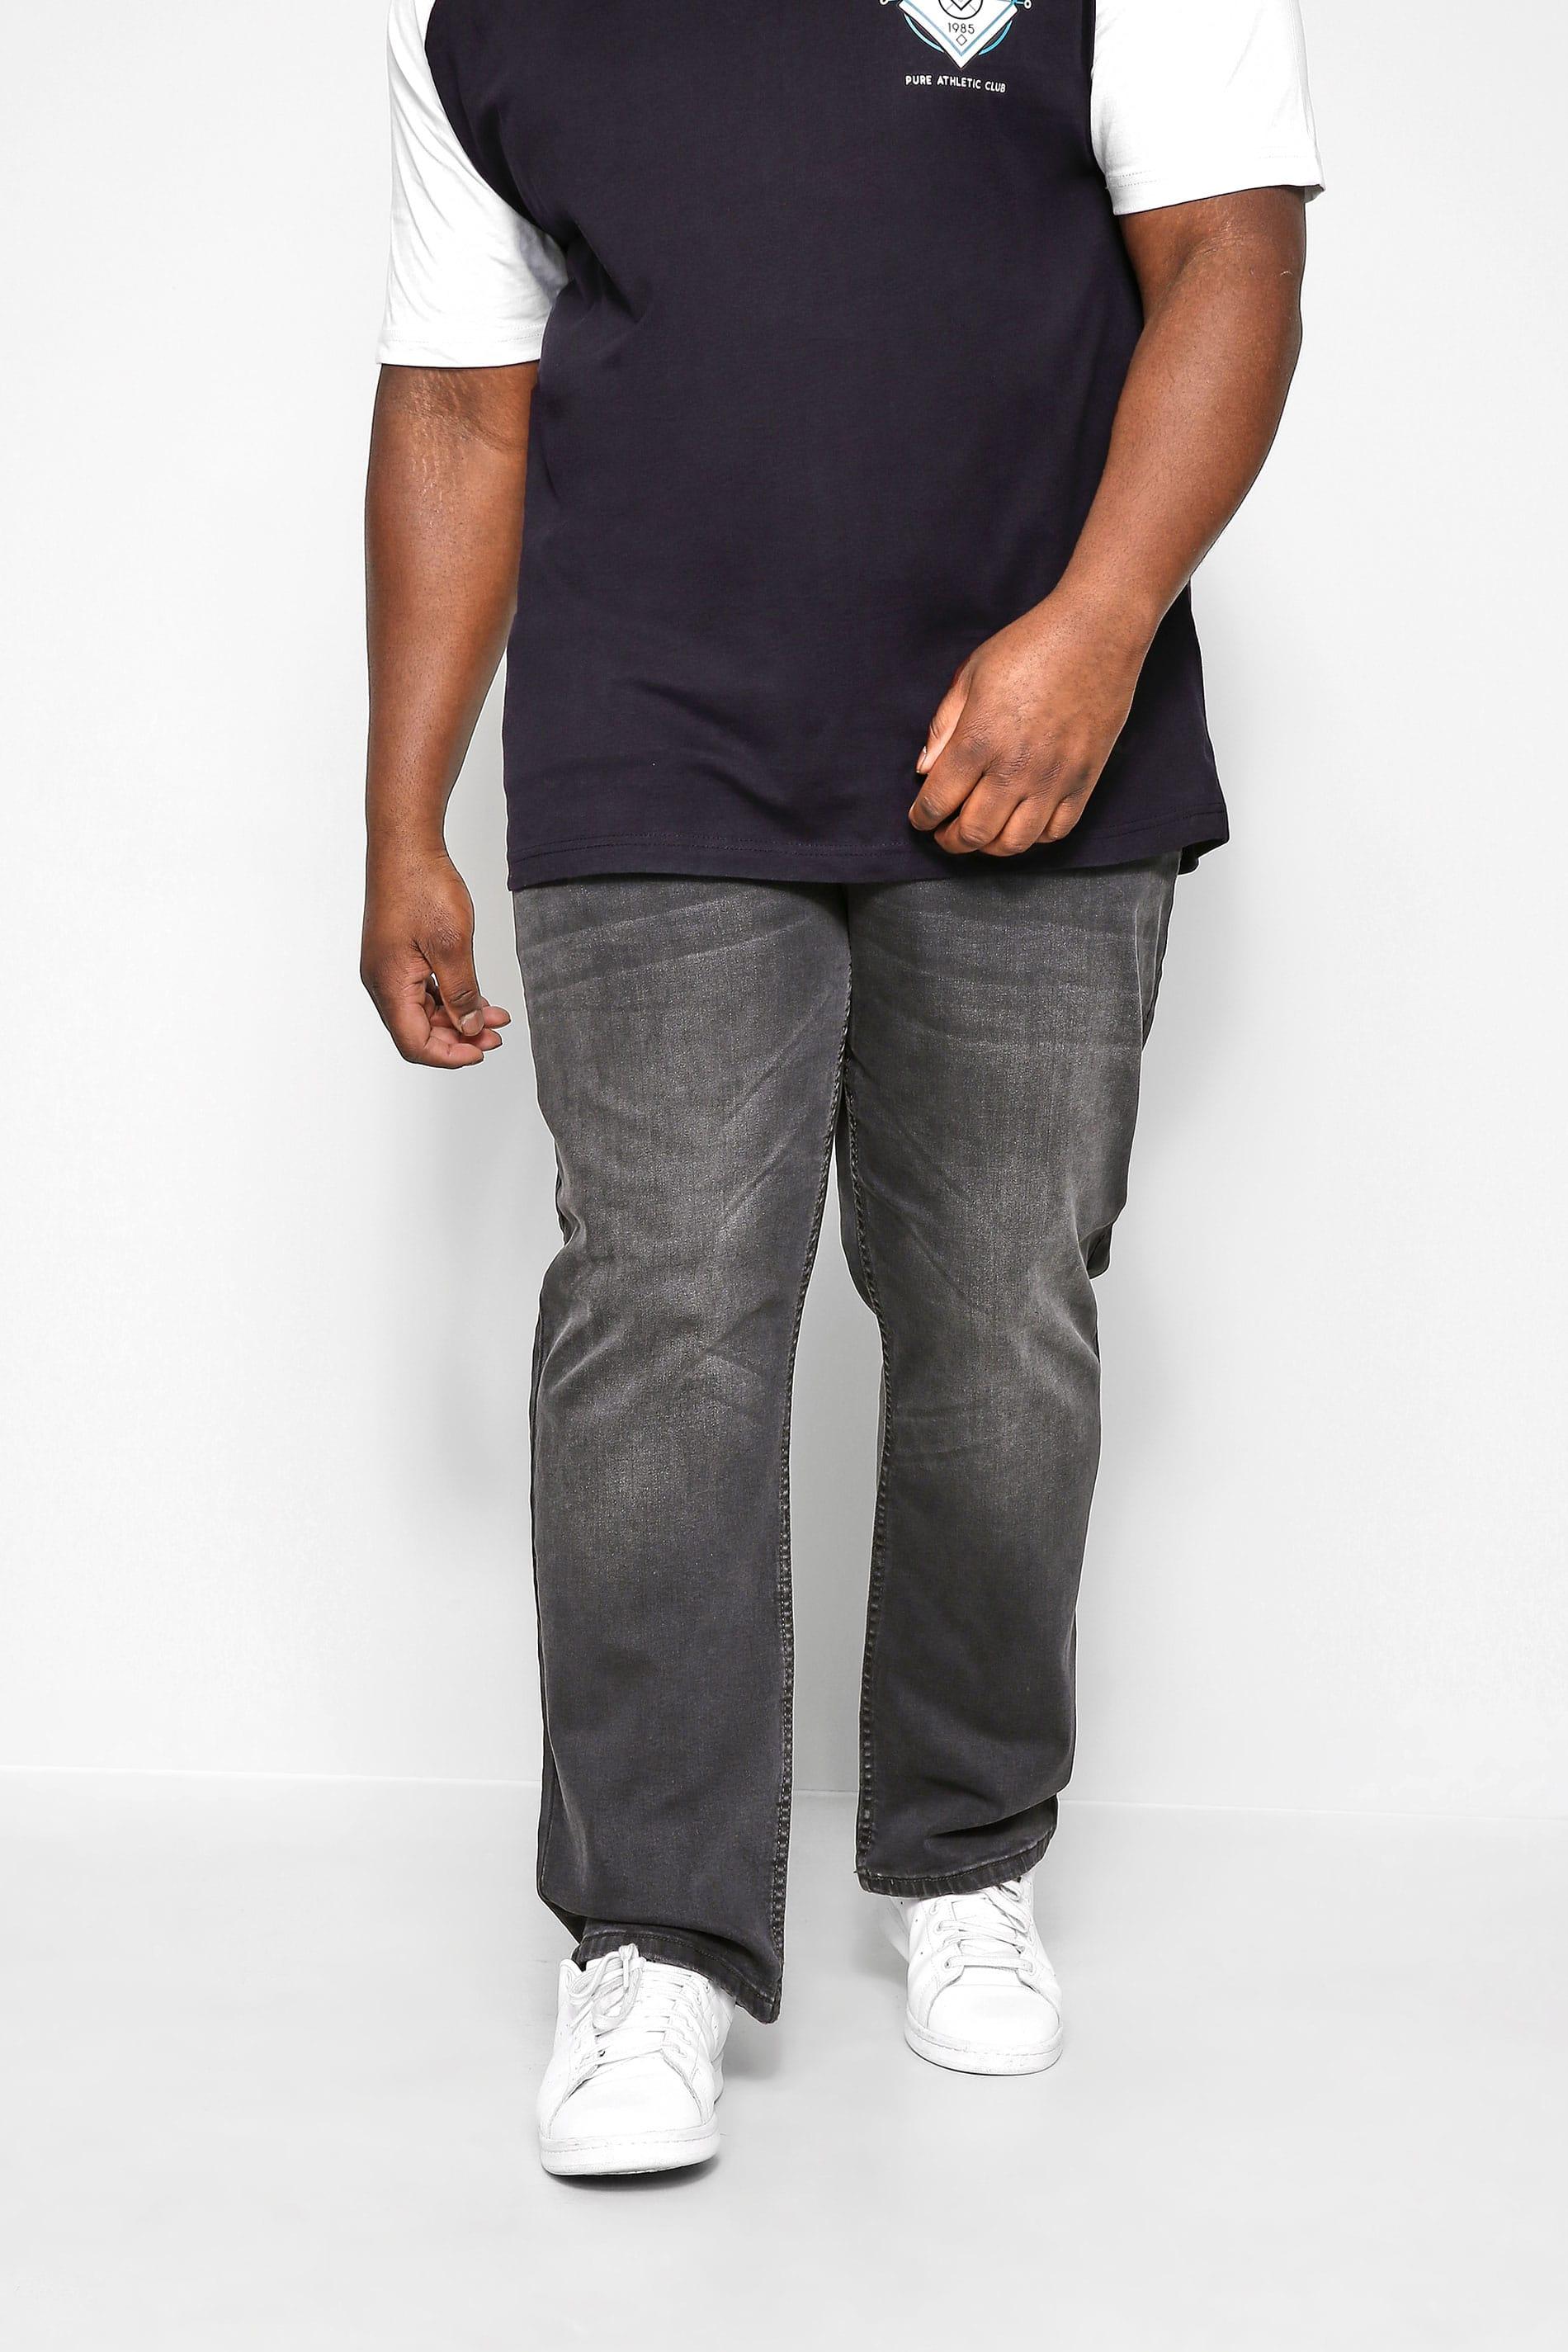 KAM Charcoal Grey Stretch Jeans